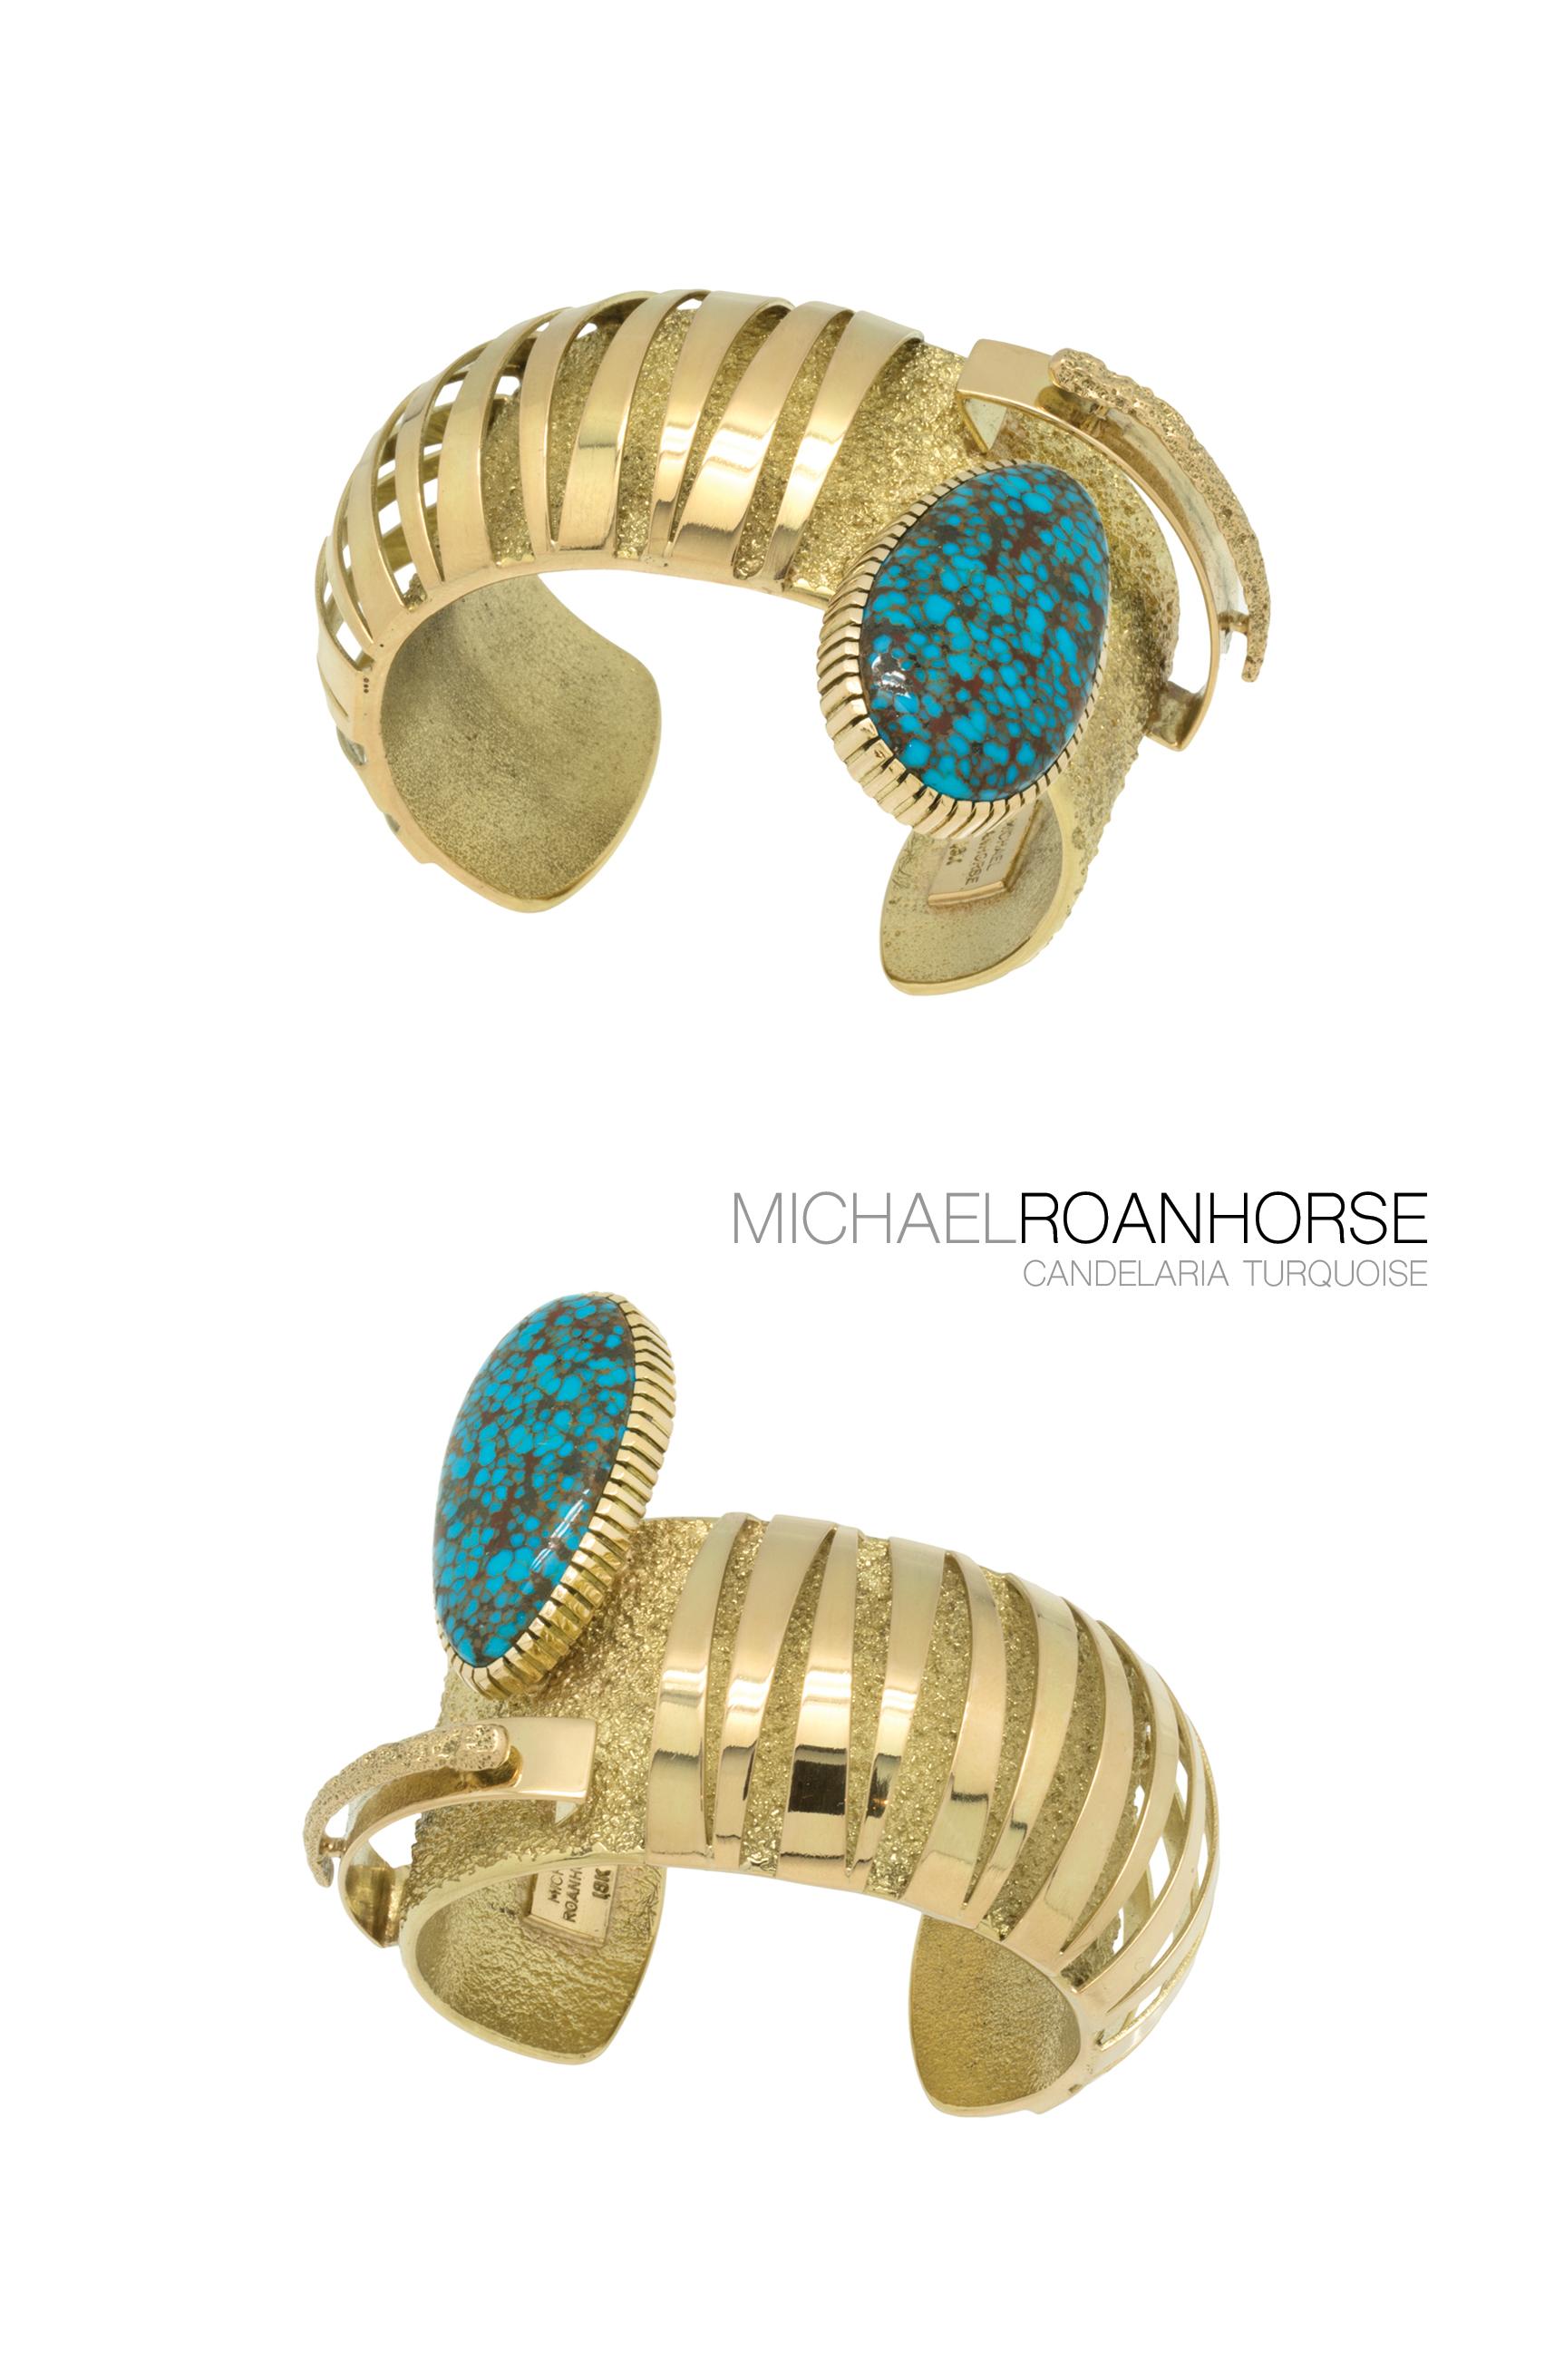 18k gold bracelet with Candelaria turquoise